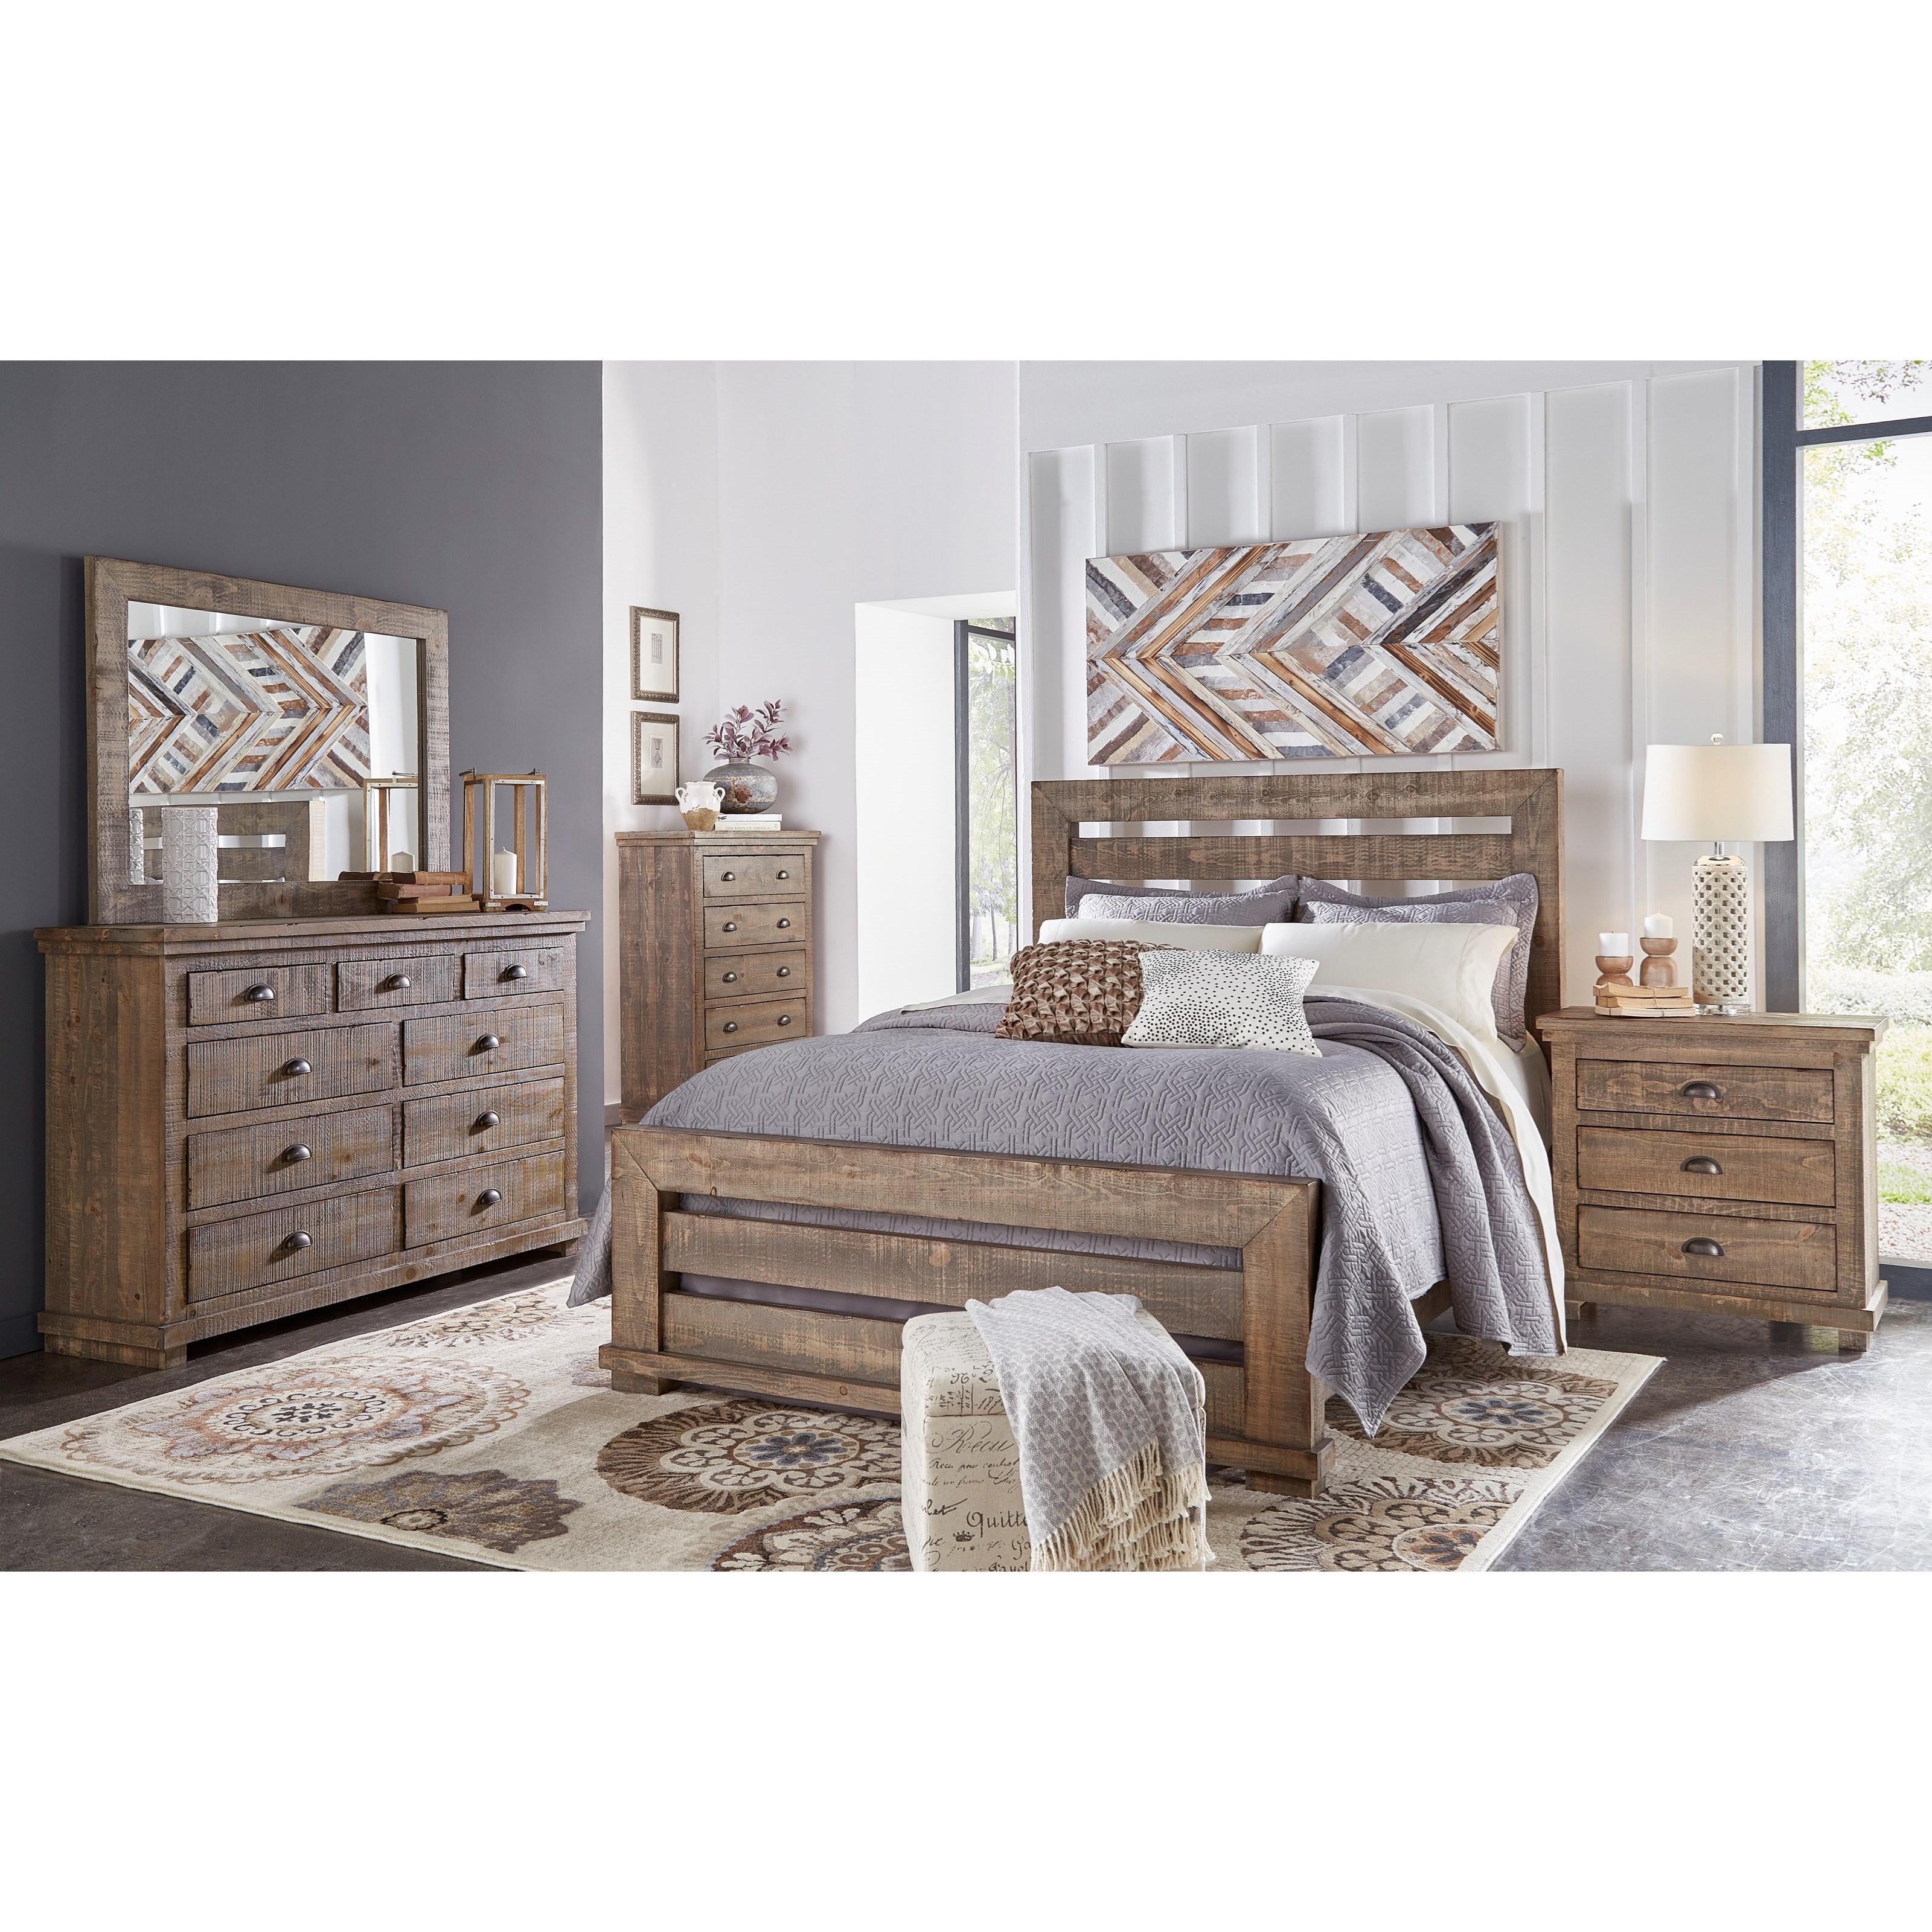 Willow California King Bedroom Group by Progressive Furniture at Bullard Furniture